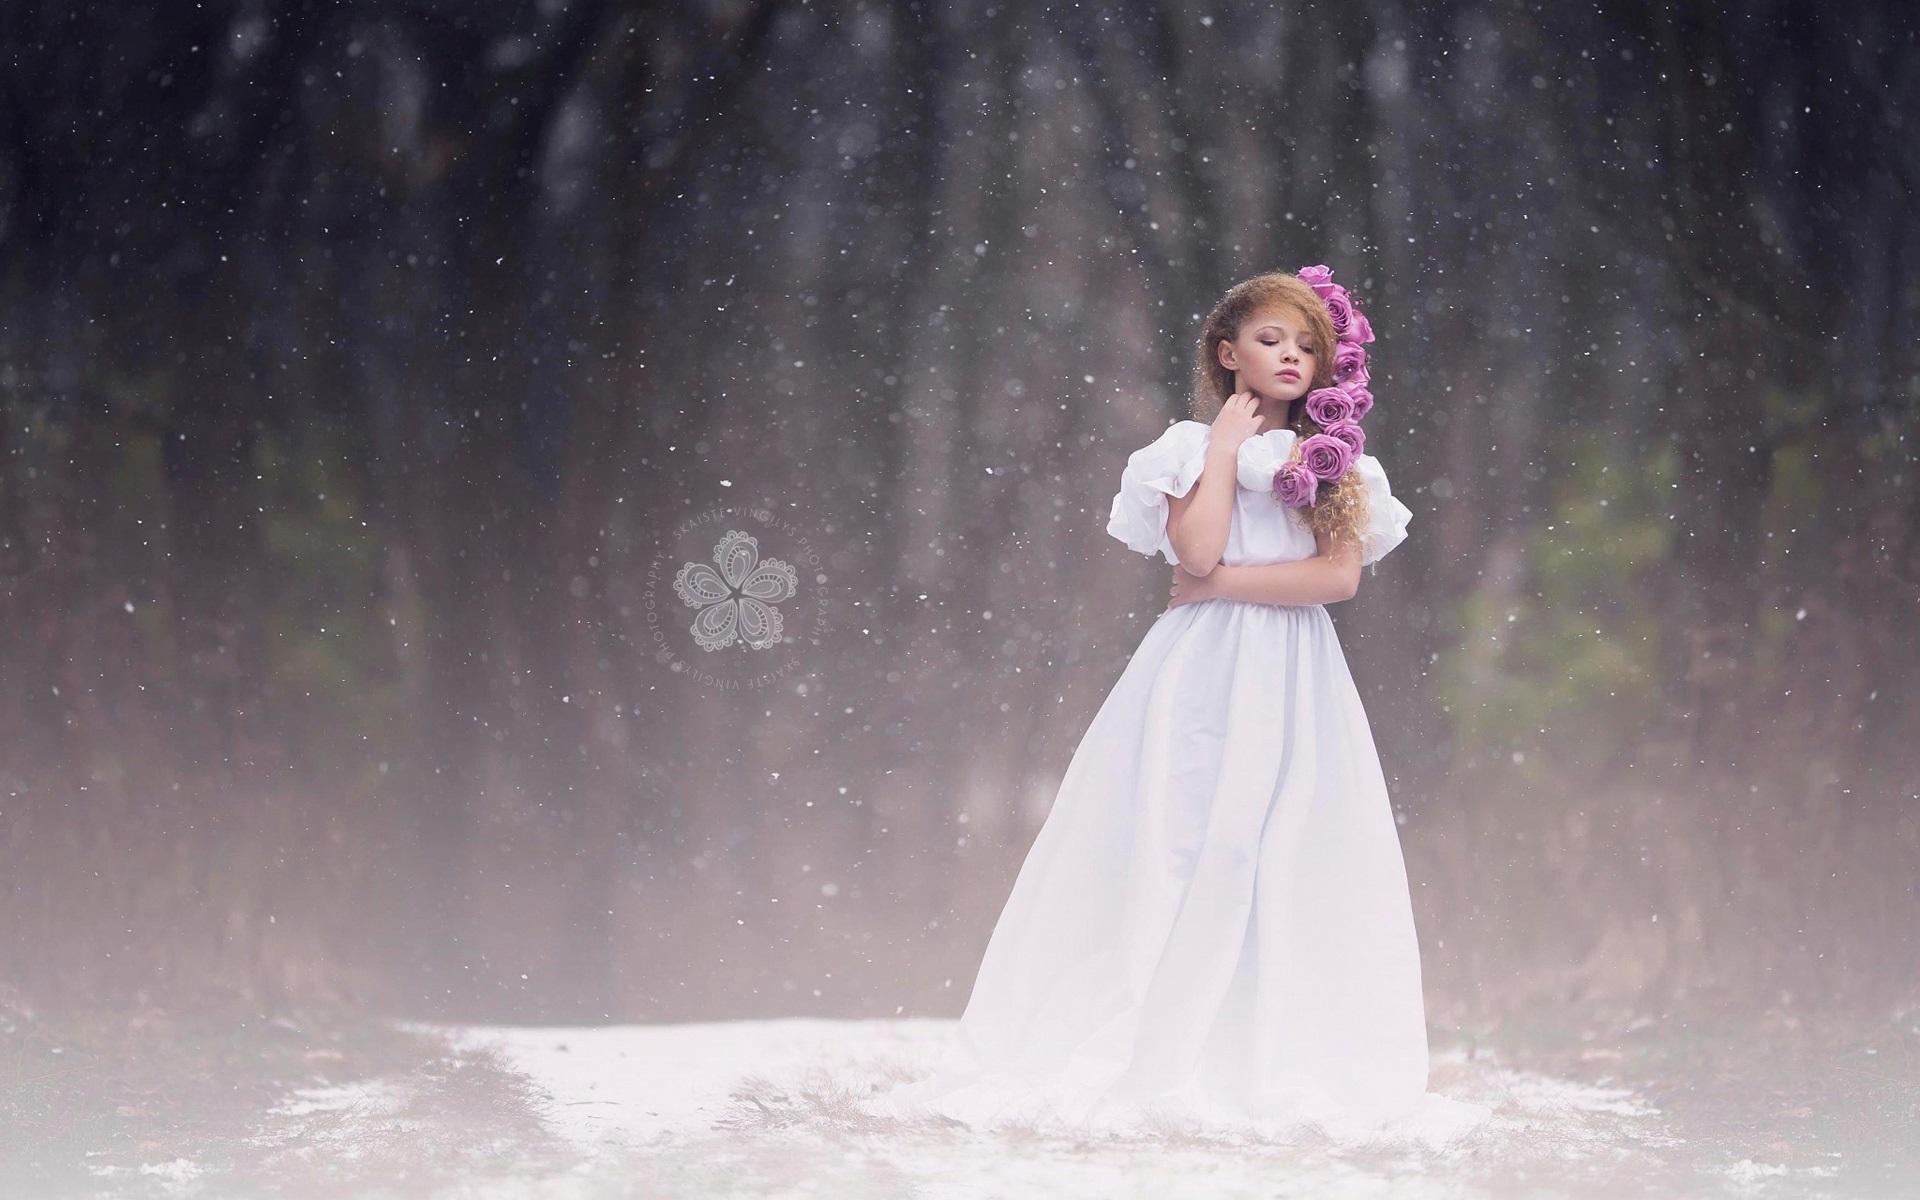 Wallpaper cute little girl white dress snow 1920x1200 hd - Cute little girl pic hd ...